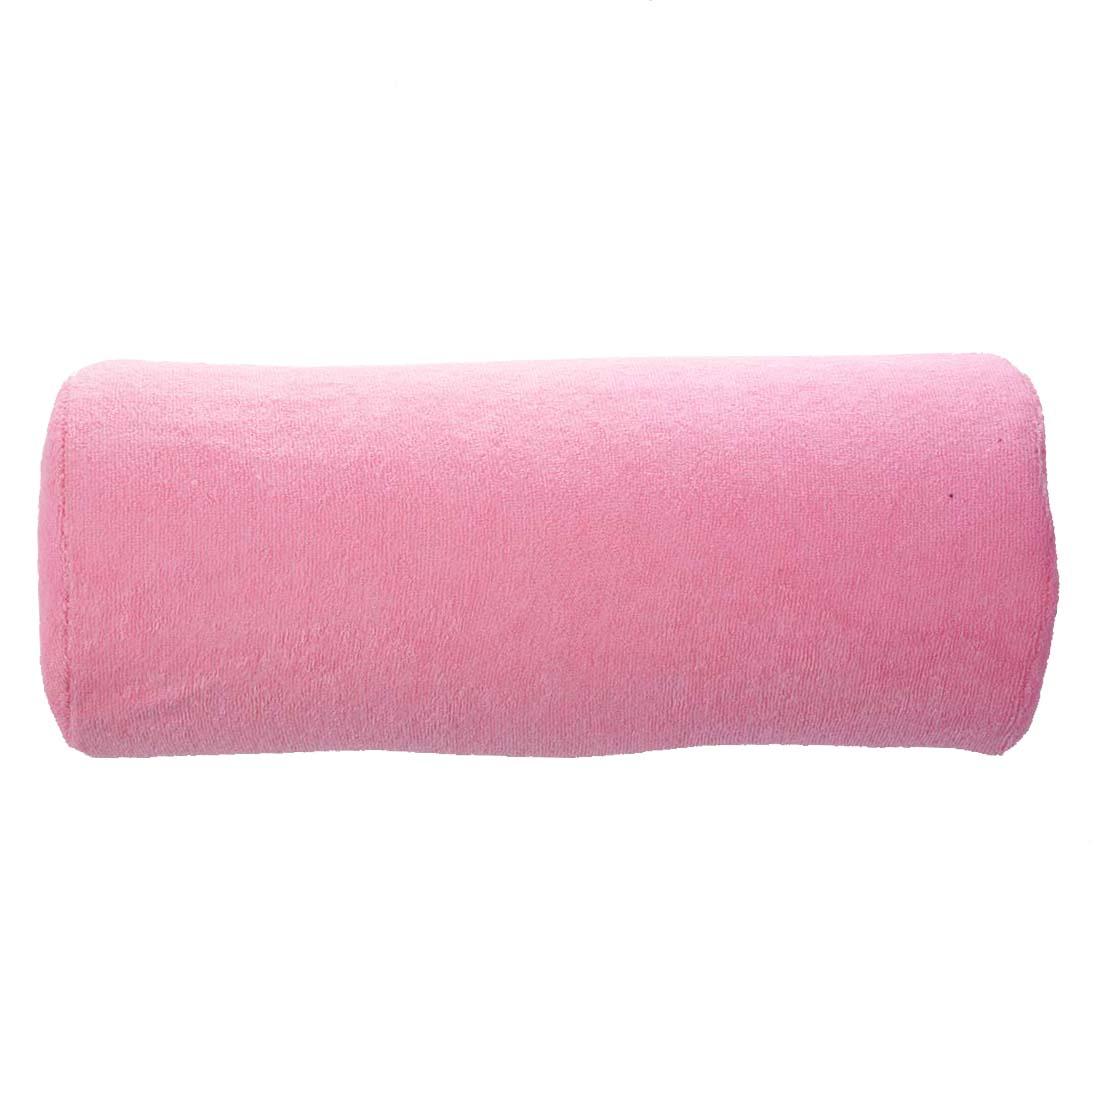 Hand Cushion Pillow Rest for Nail Art Manicure Salon W4Z6 5